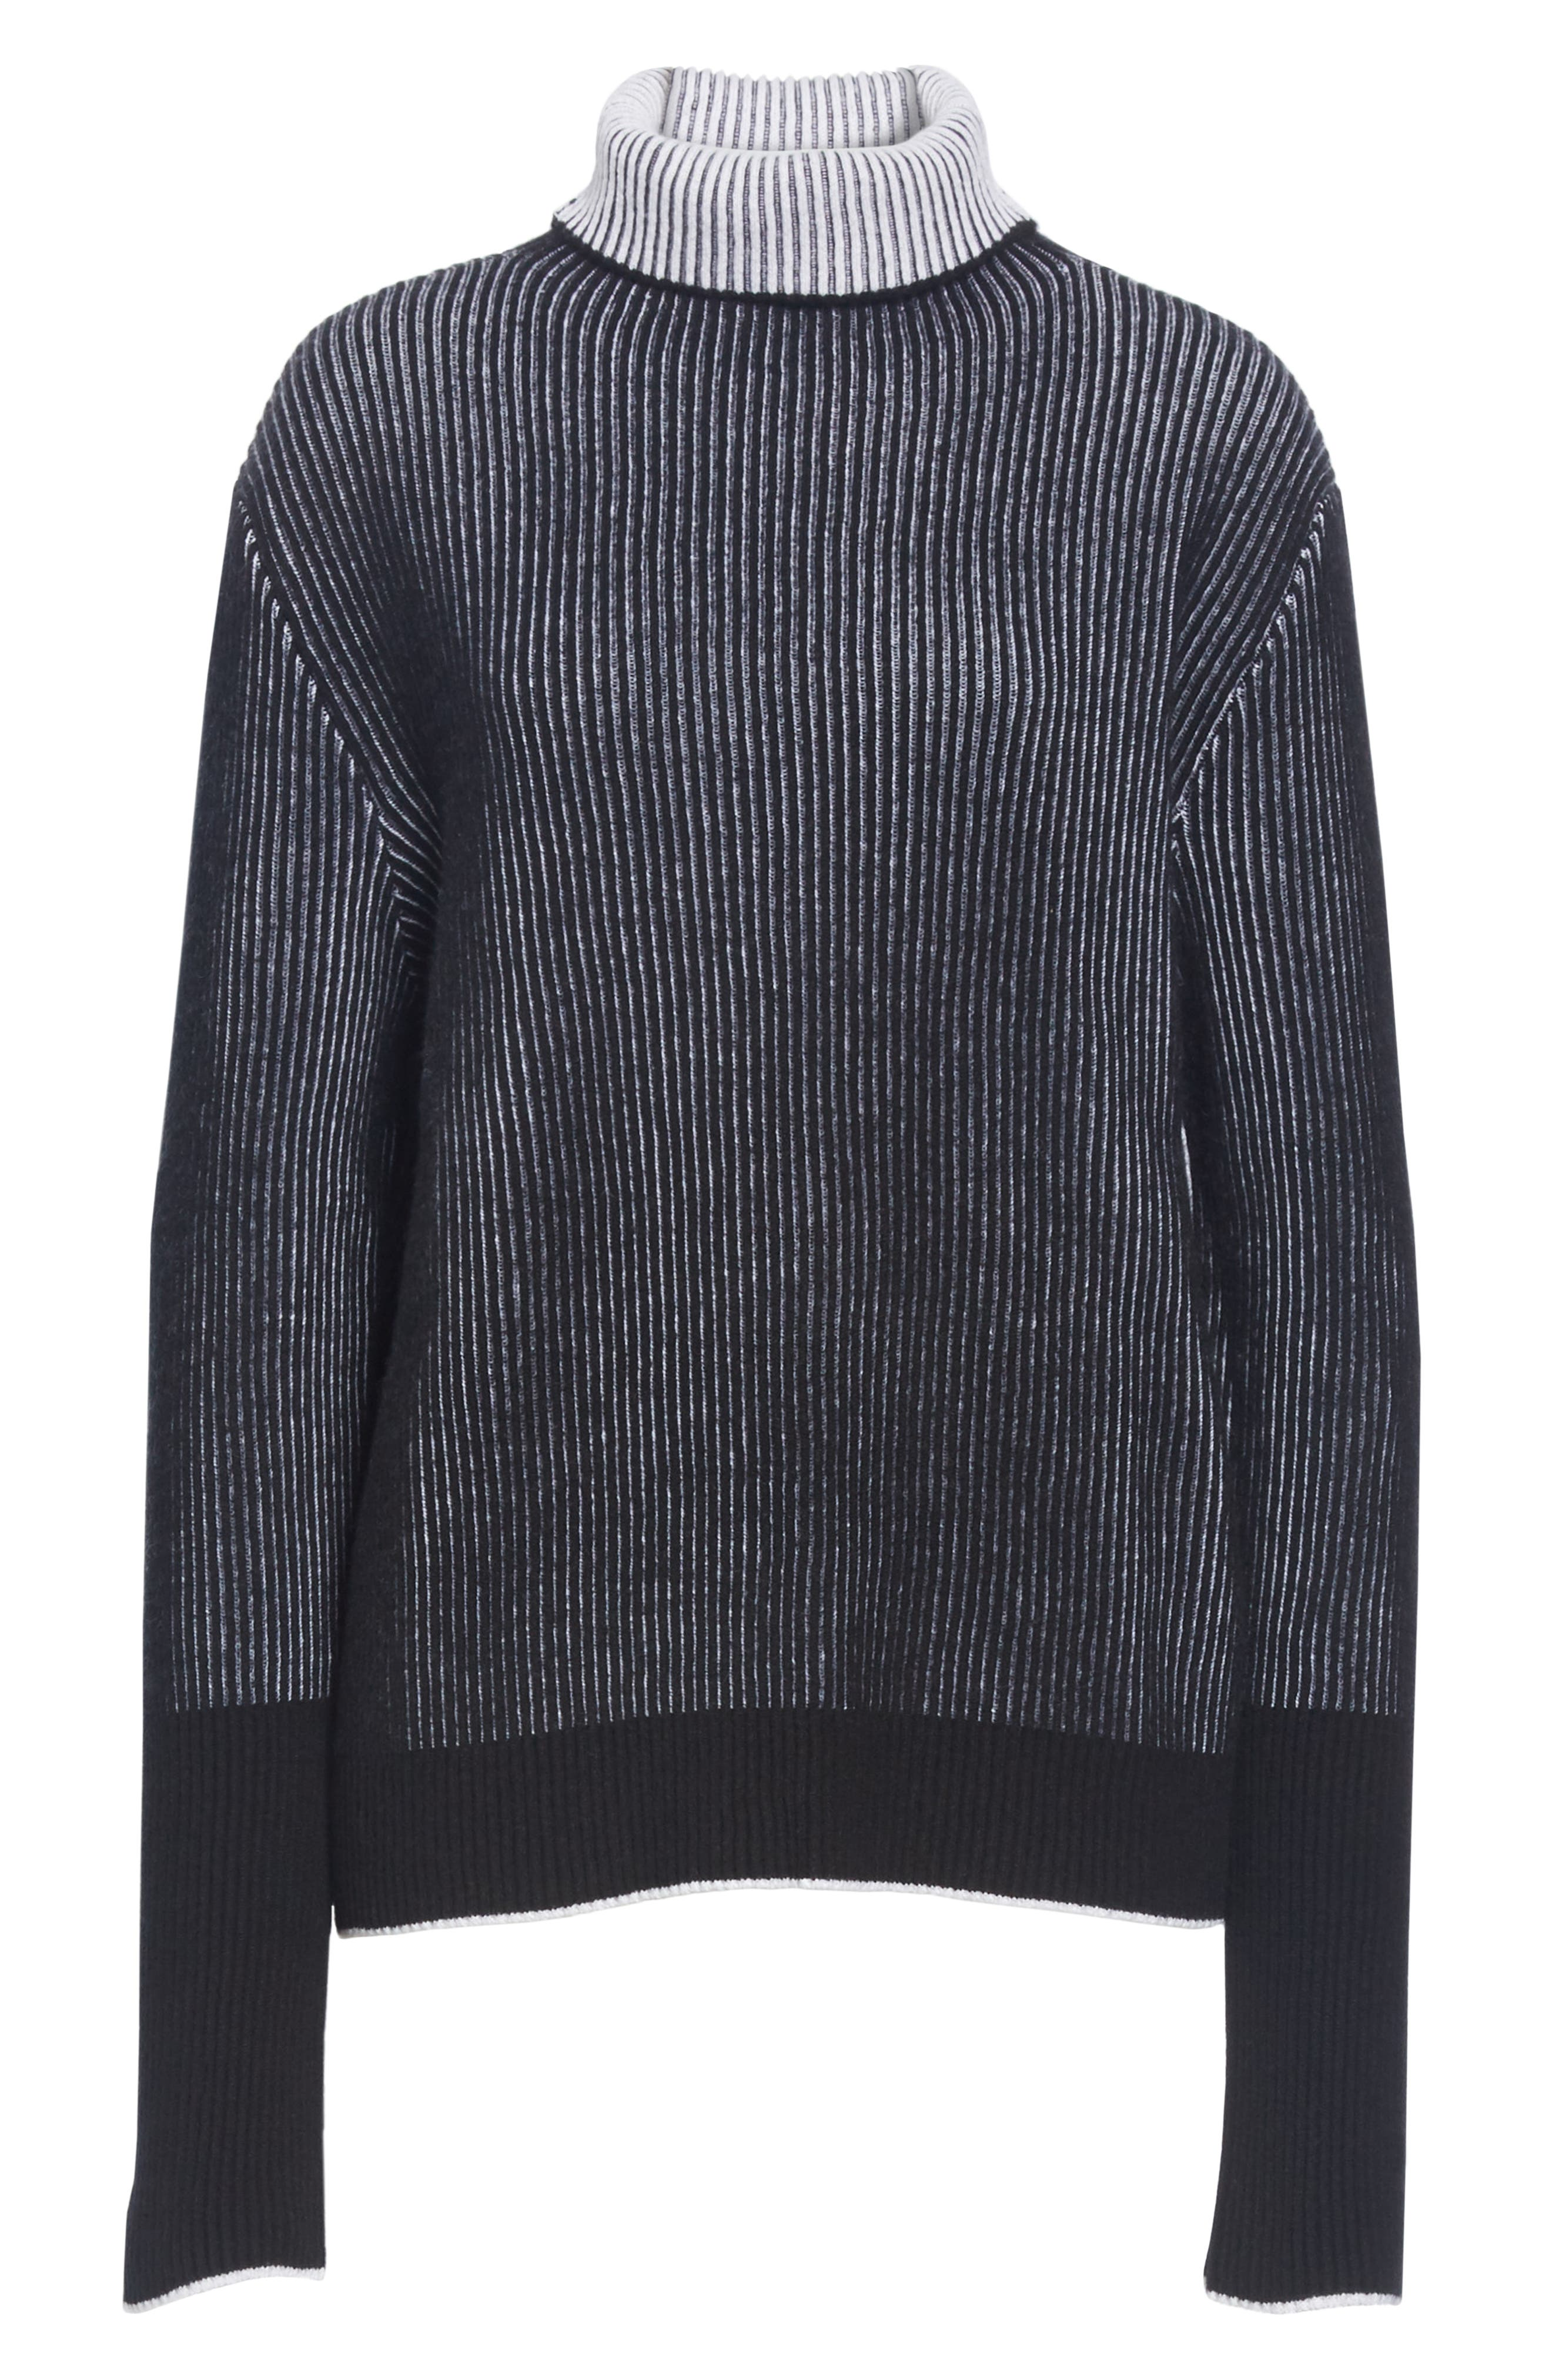 AAA Turtleneck Cashmere Sweater,                             Alternate thumbnail 6, color,                             BLACK/ CREAM